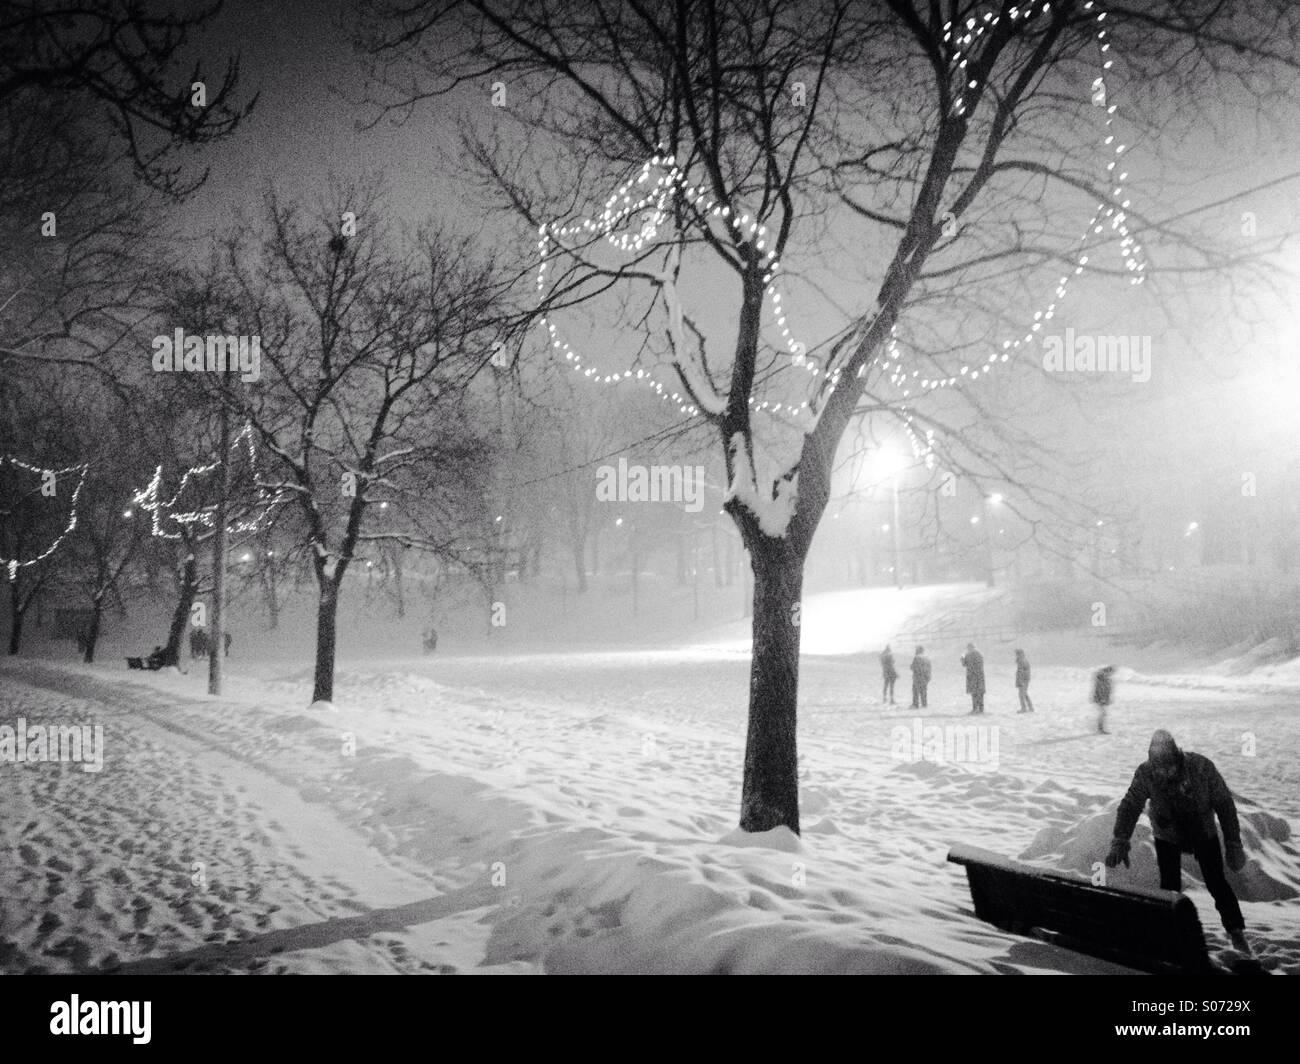 A Canadian winter scene - Stock Image